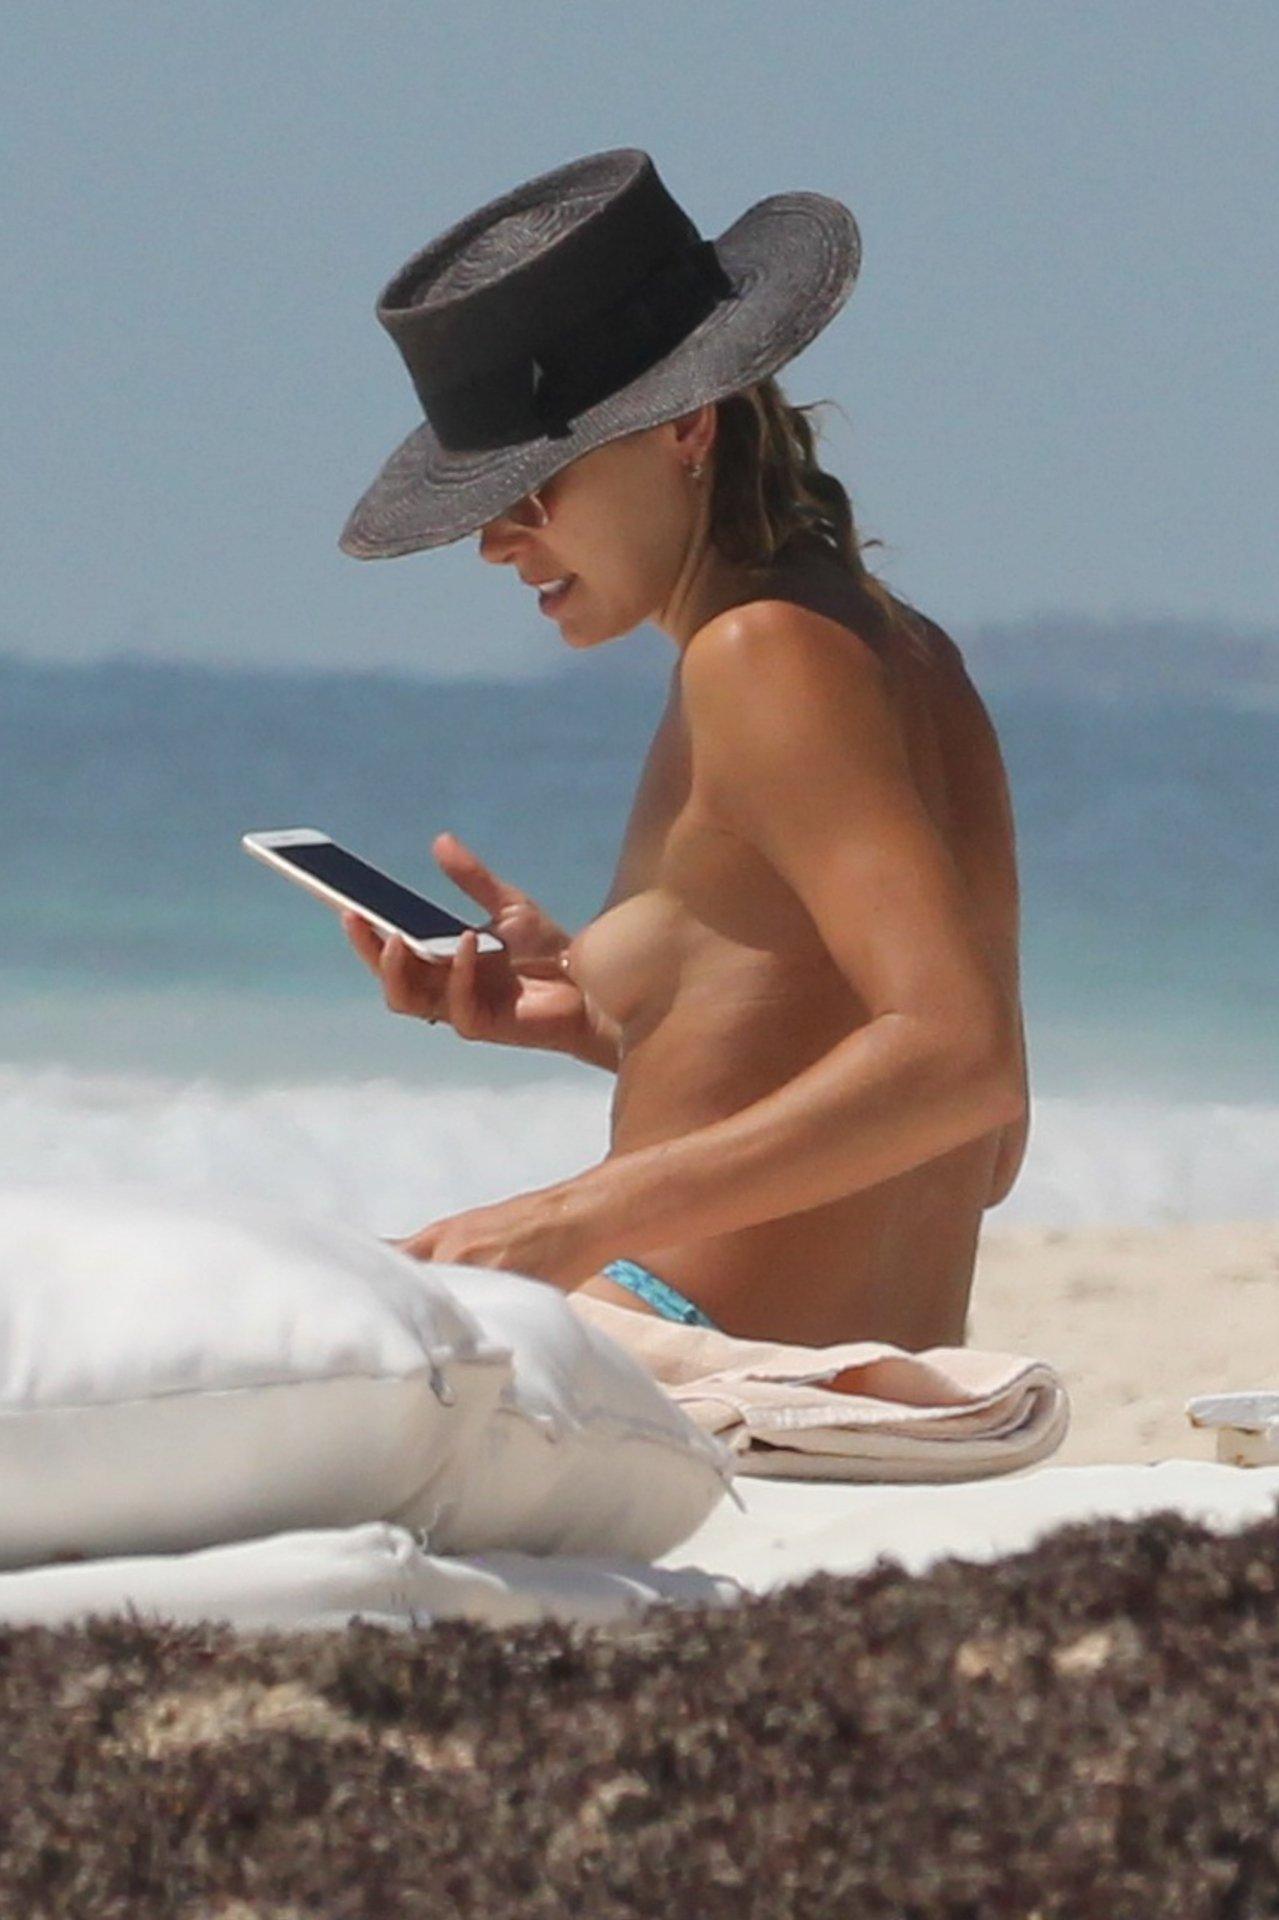 ashley hart bikini topless hot celebs home